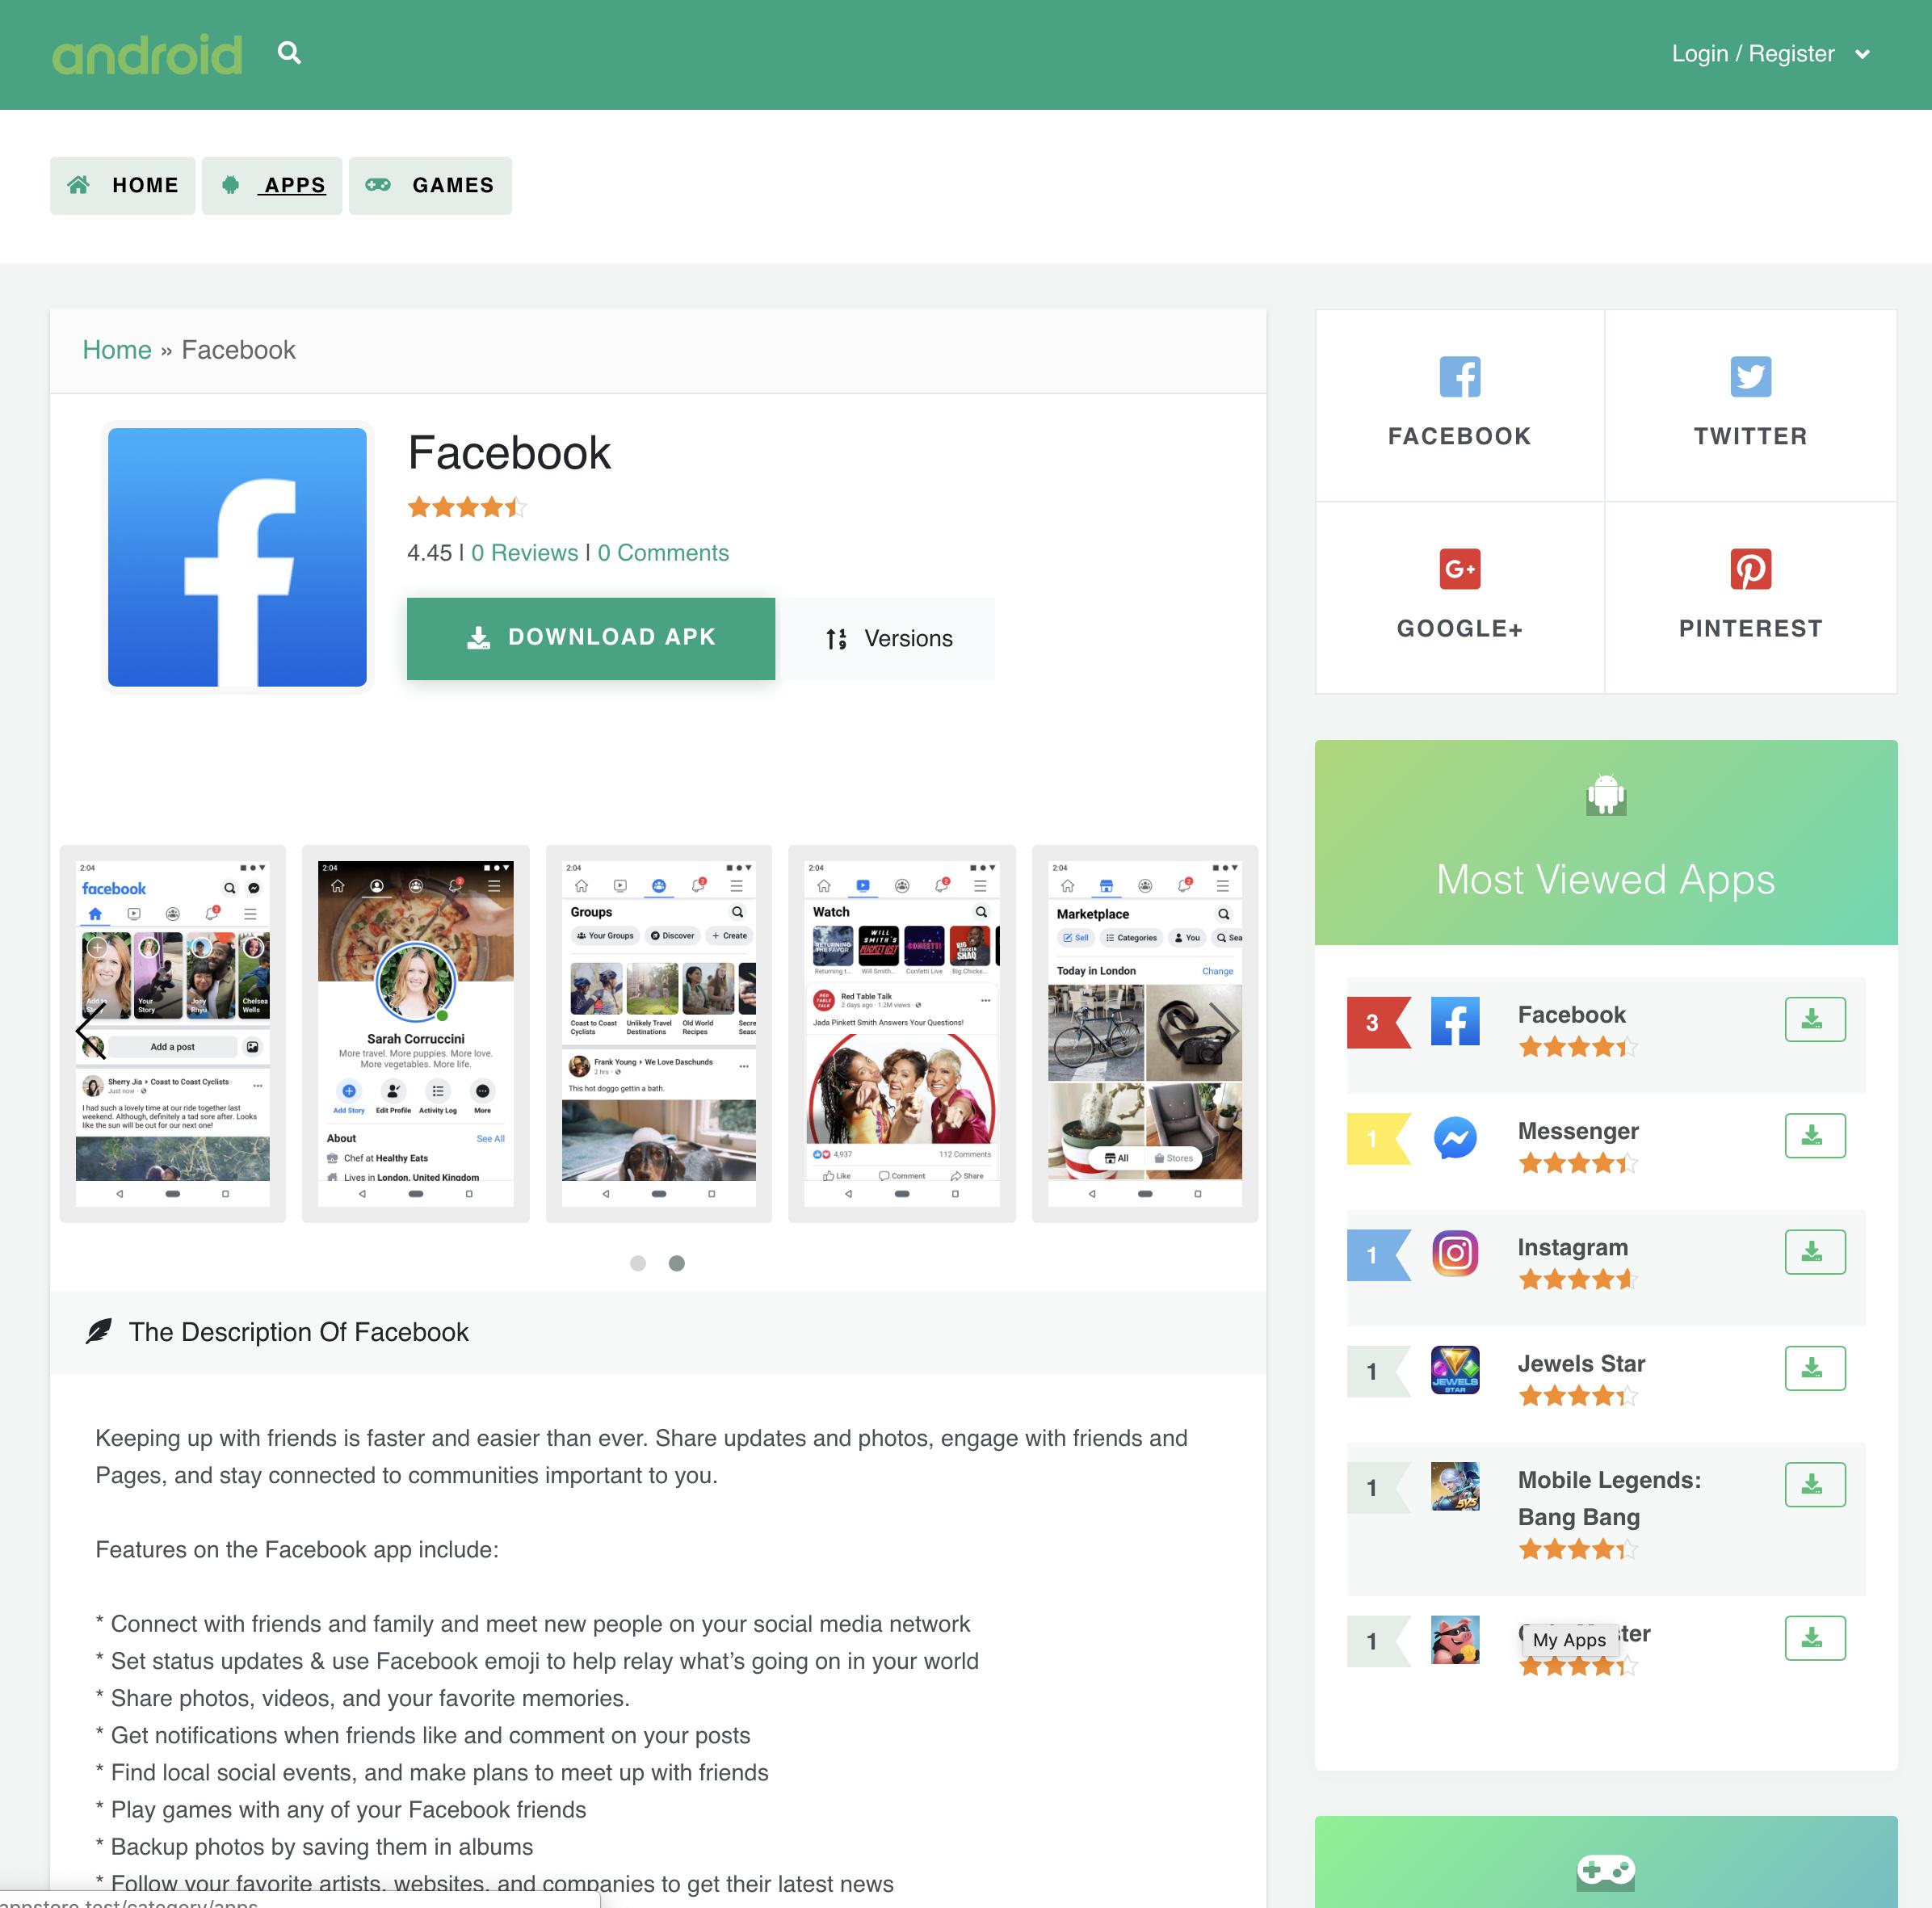 Google Play App Store [CMS] 2 0